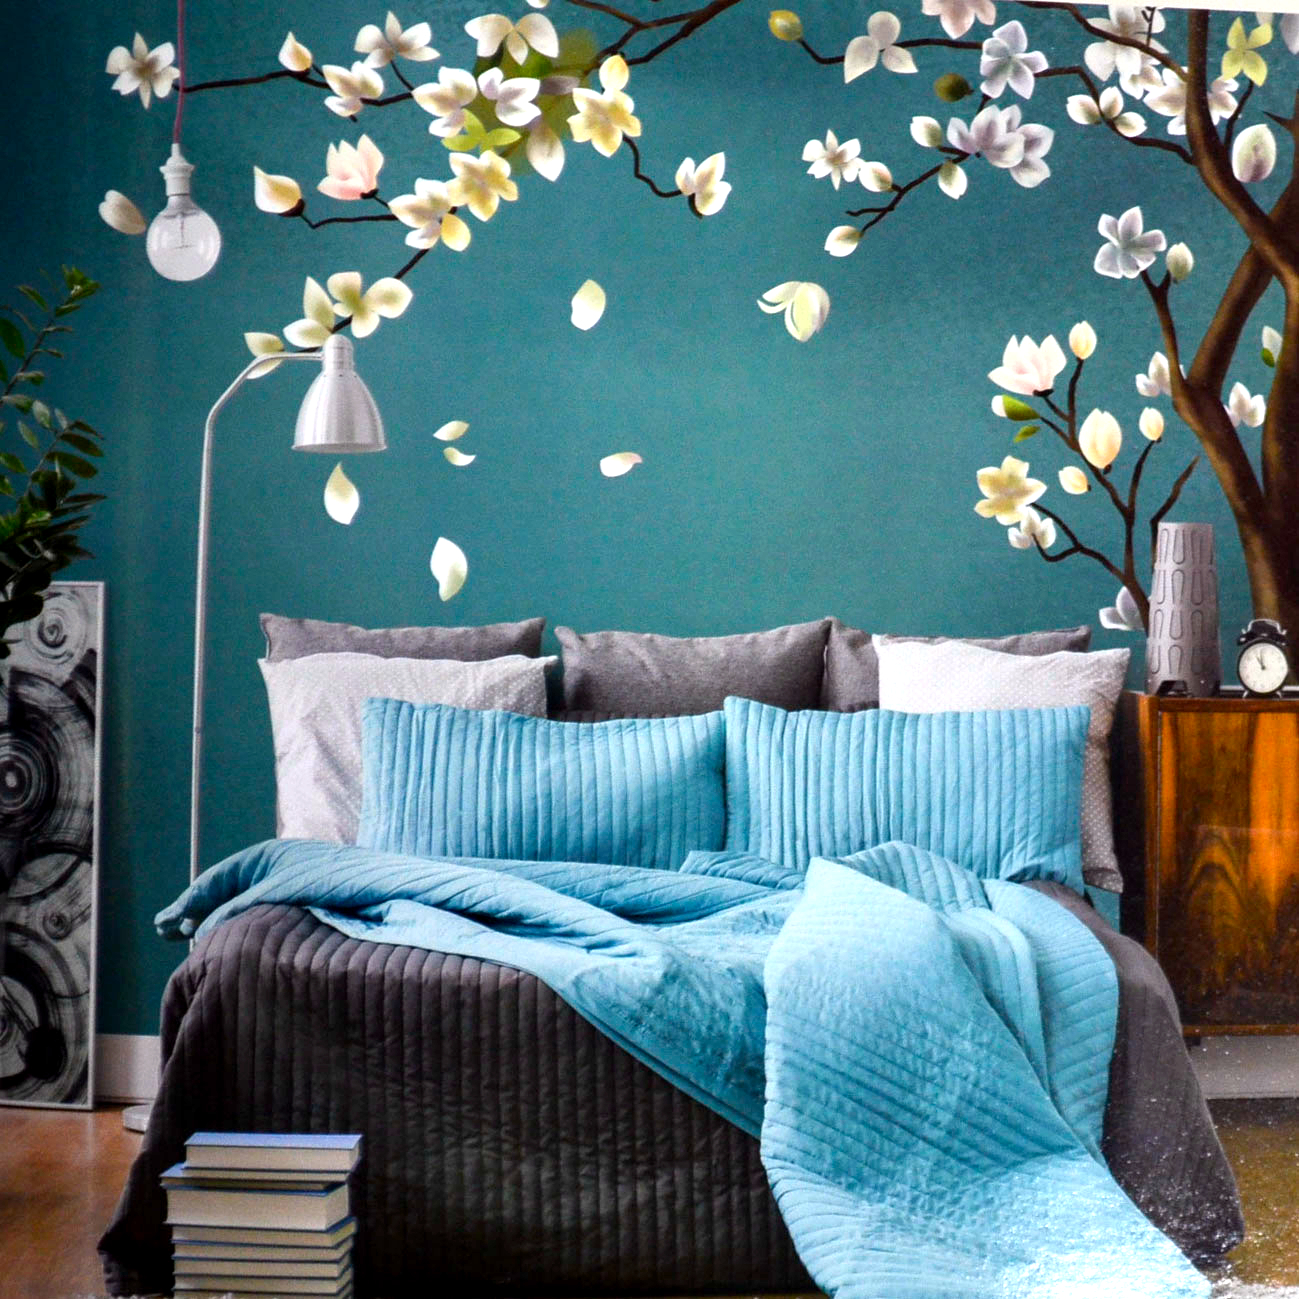 Best Selling Wallpaper 3d Design Wallpaper For Bedroom